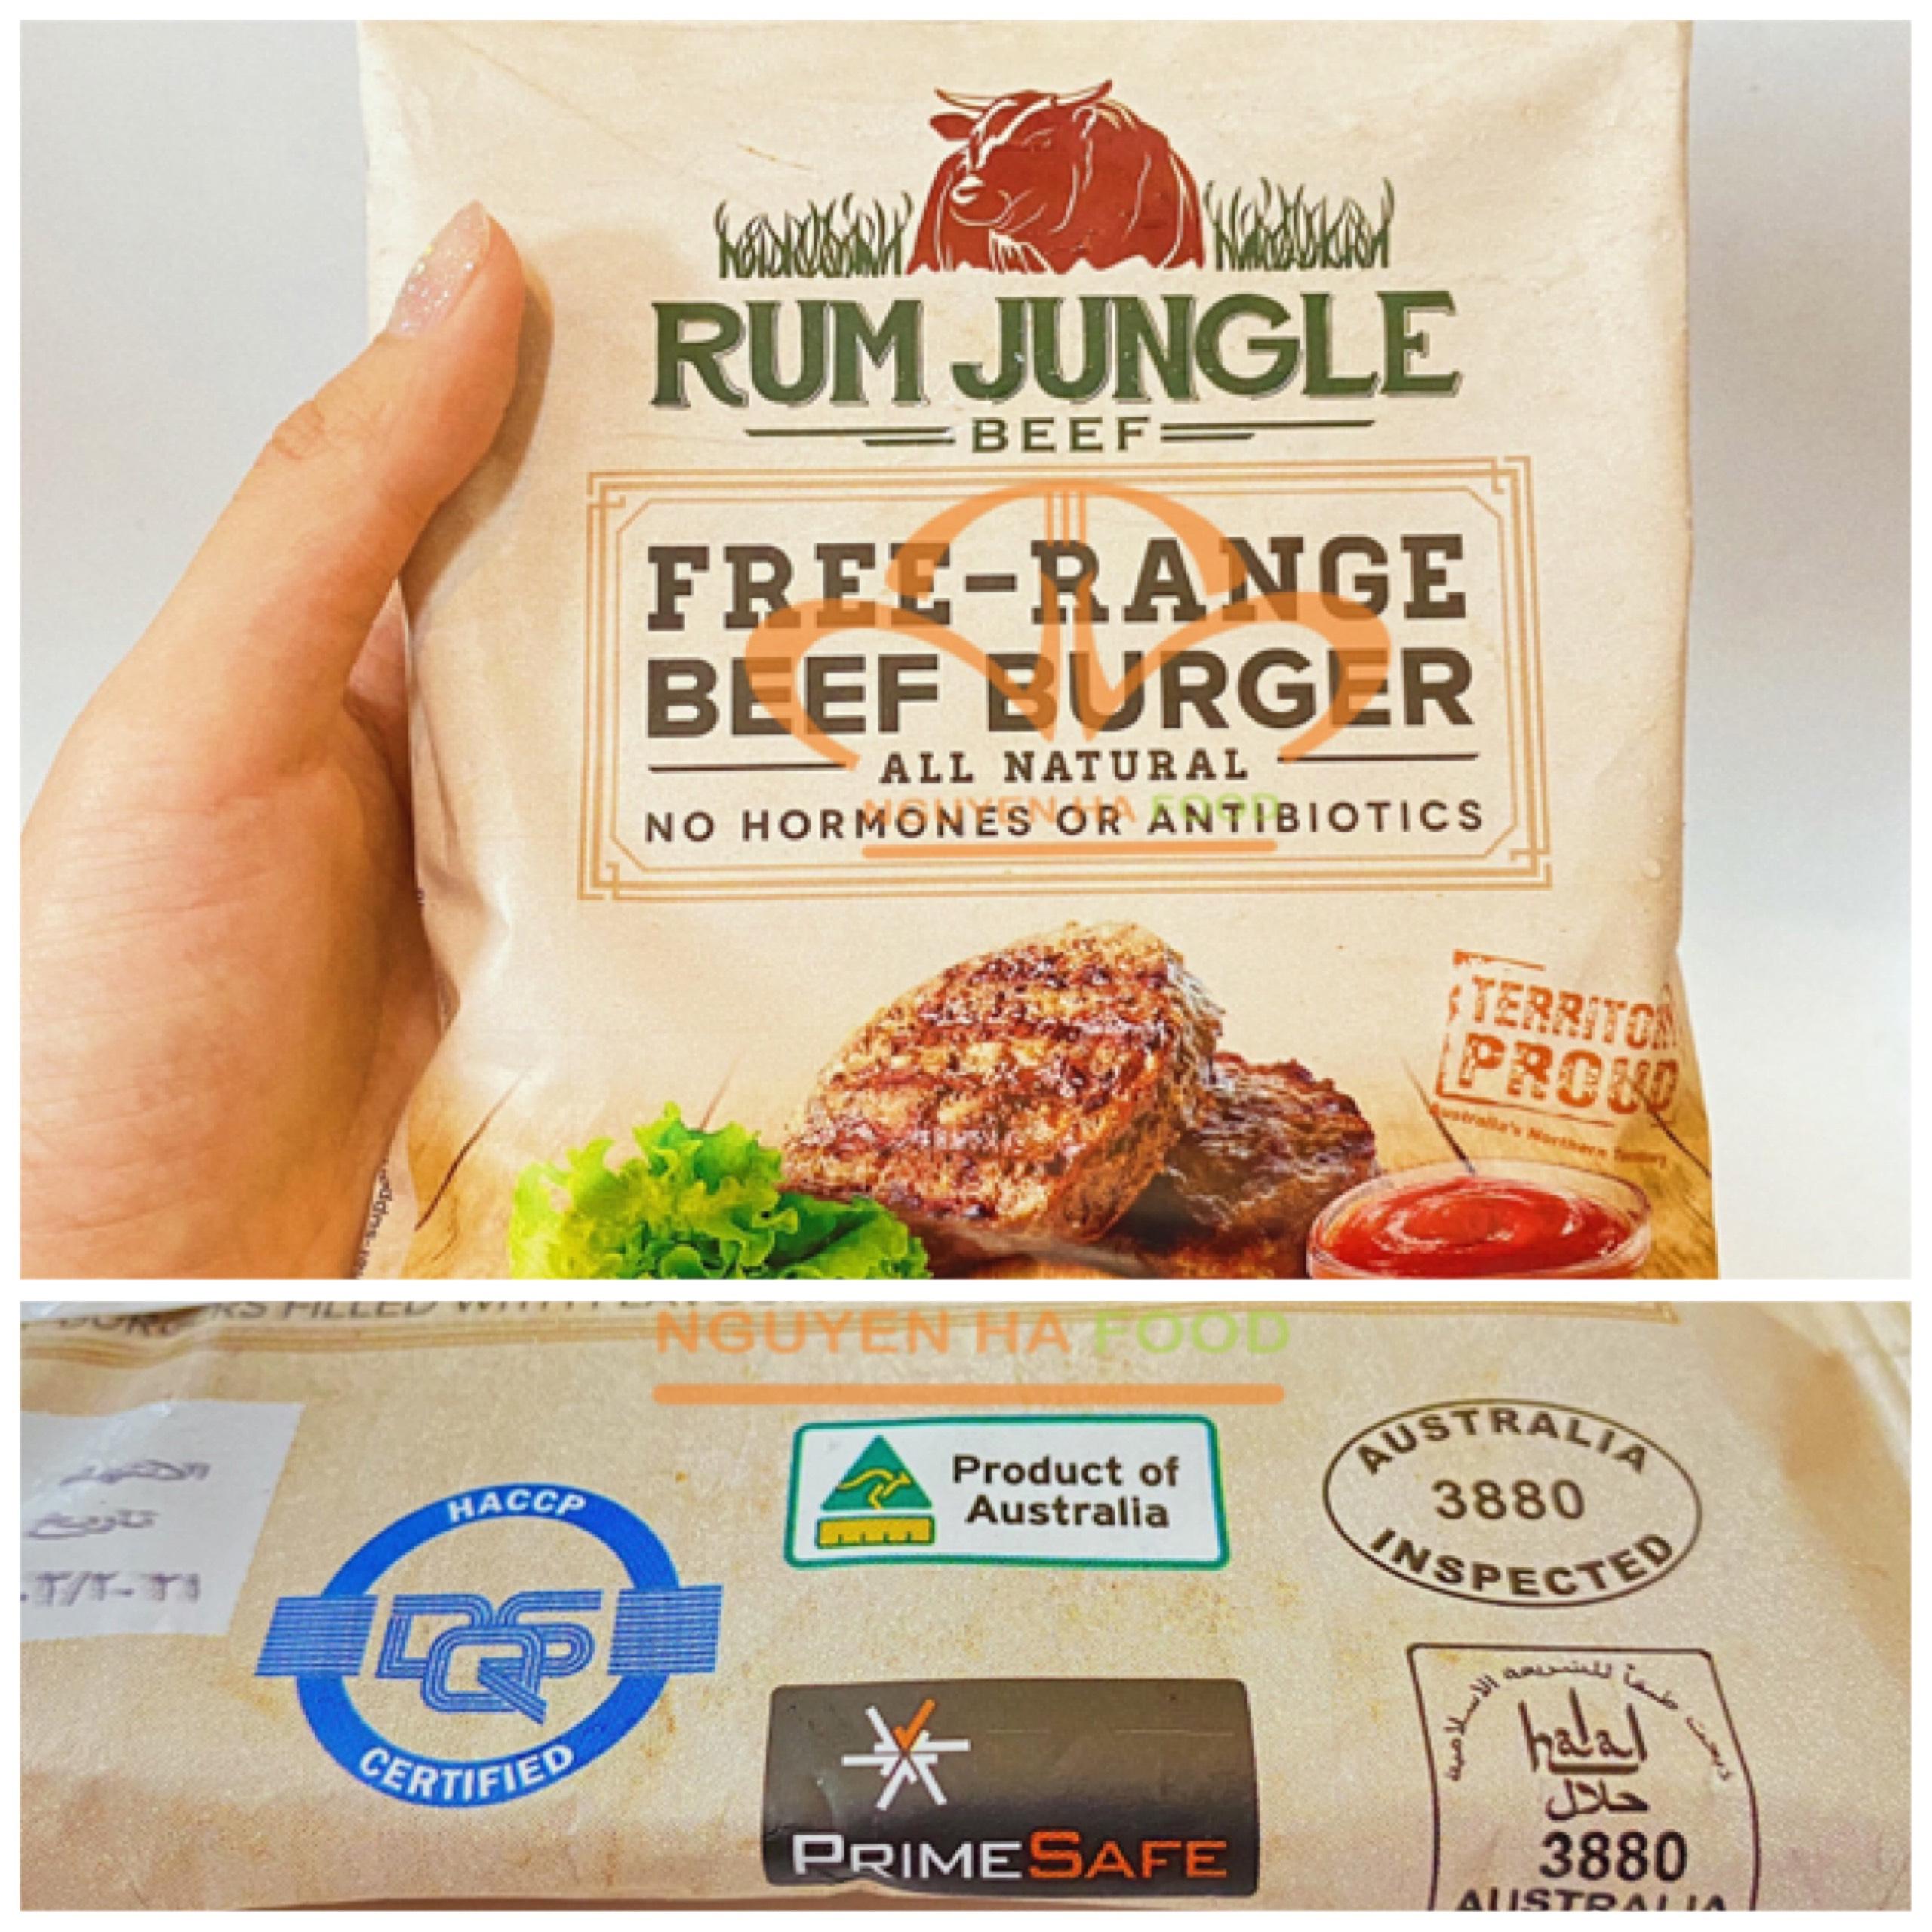 THIT BO UC HALAL NGUYEN HA FOOD - HALAL BEEF (1)